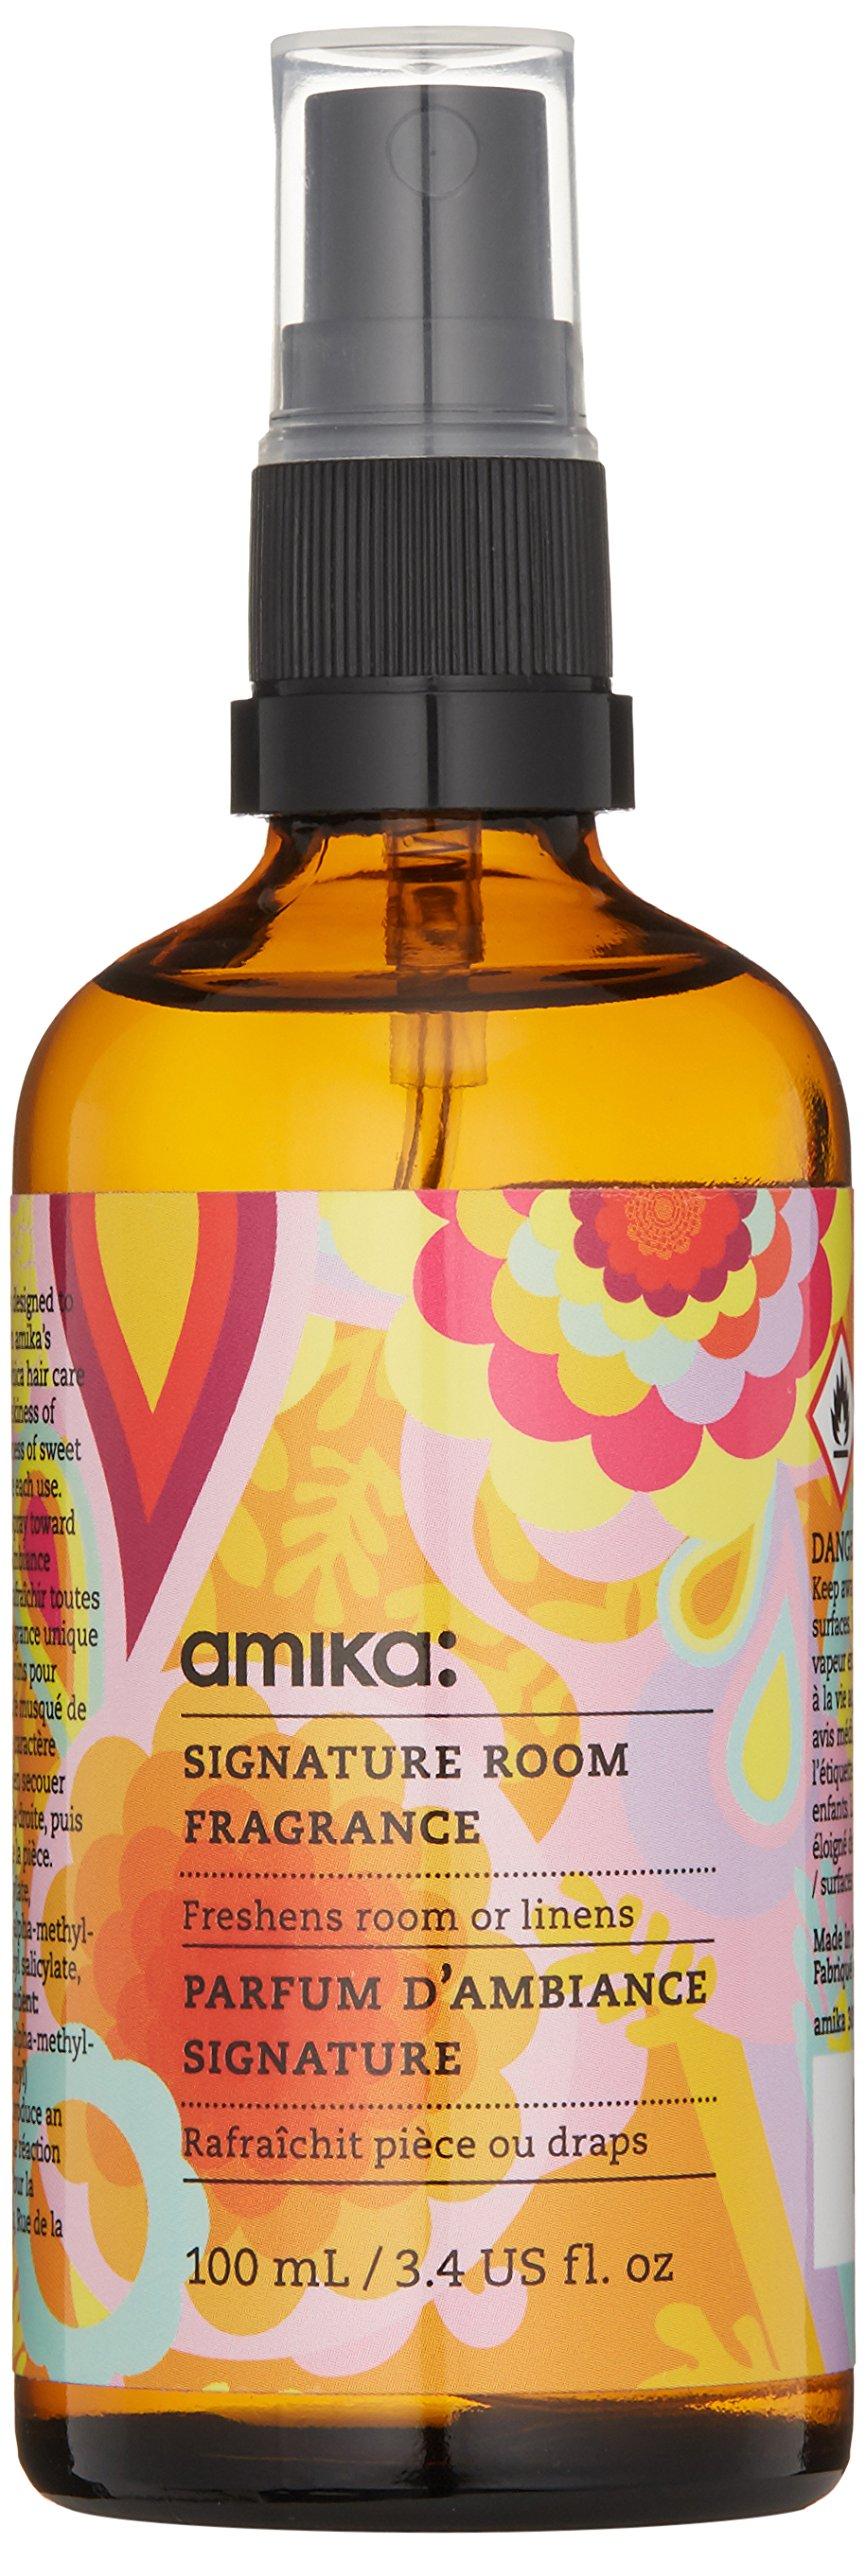 Amika Signature Room Fragrance, 3.4 Fl Oz by amika